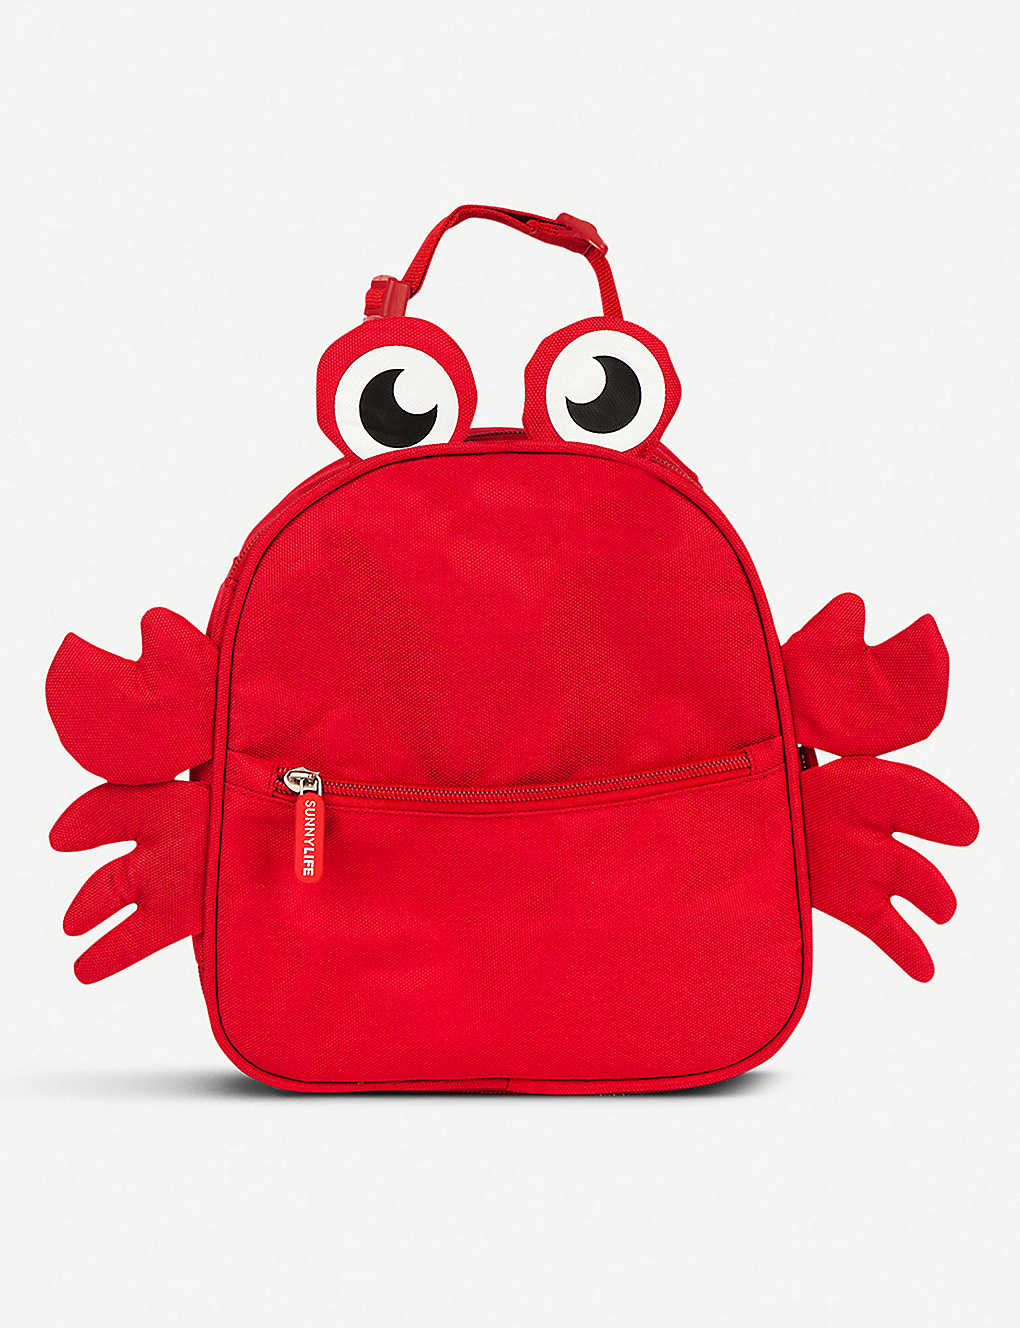 c4289fd203a0 Crab lunch bag